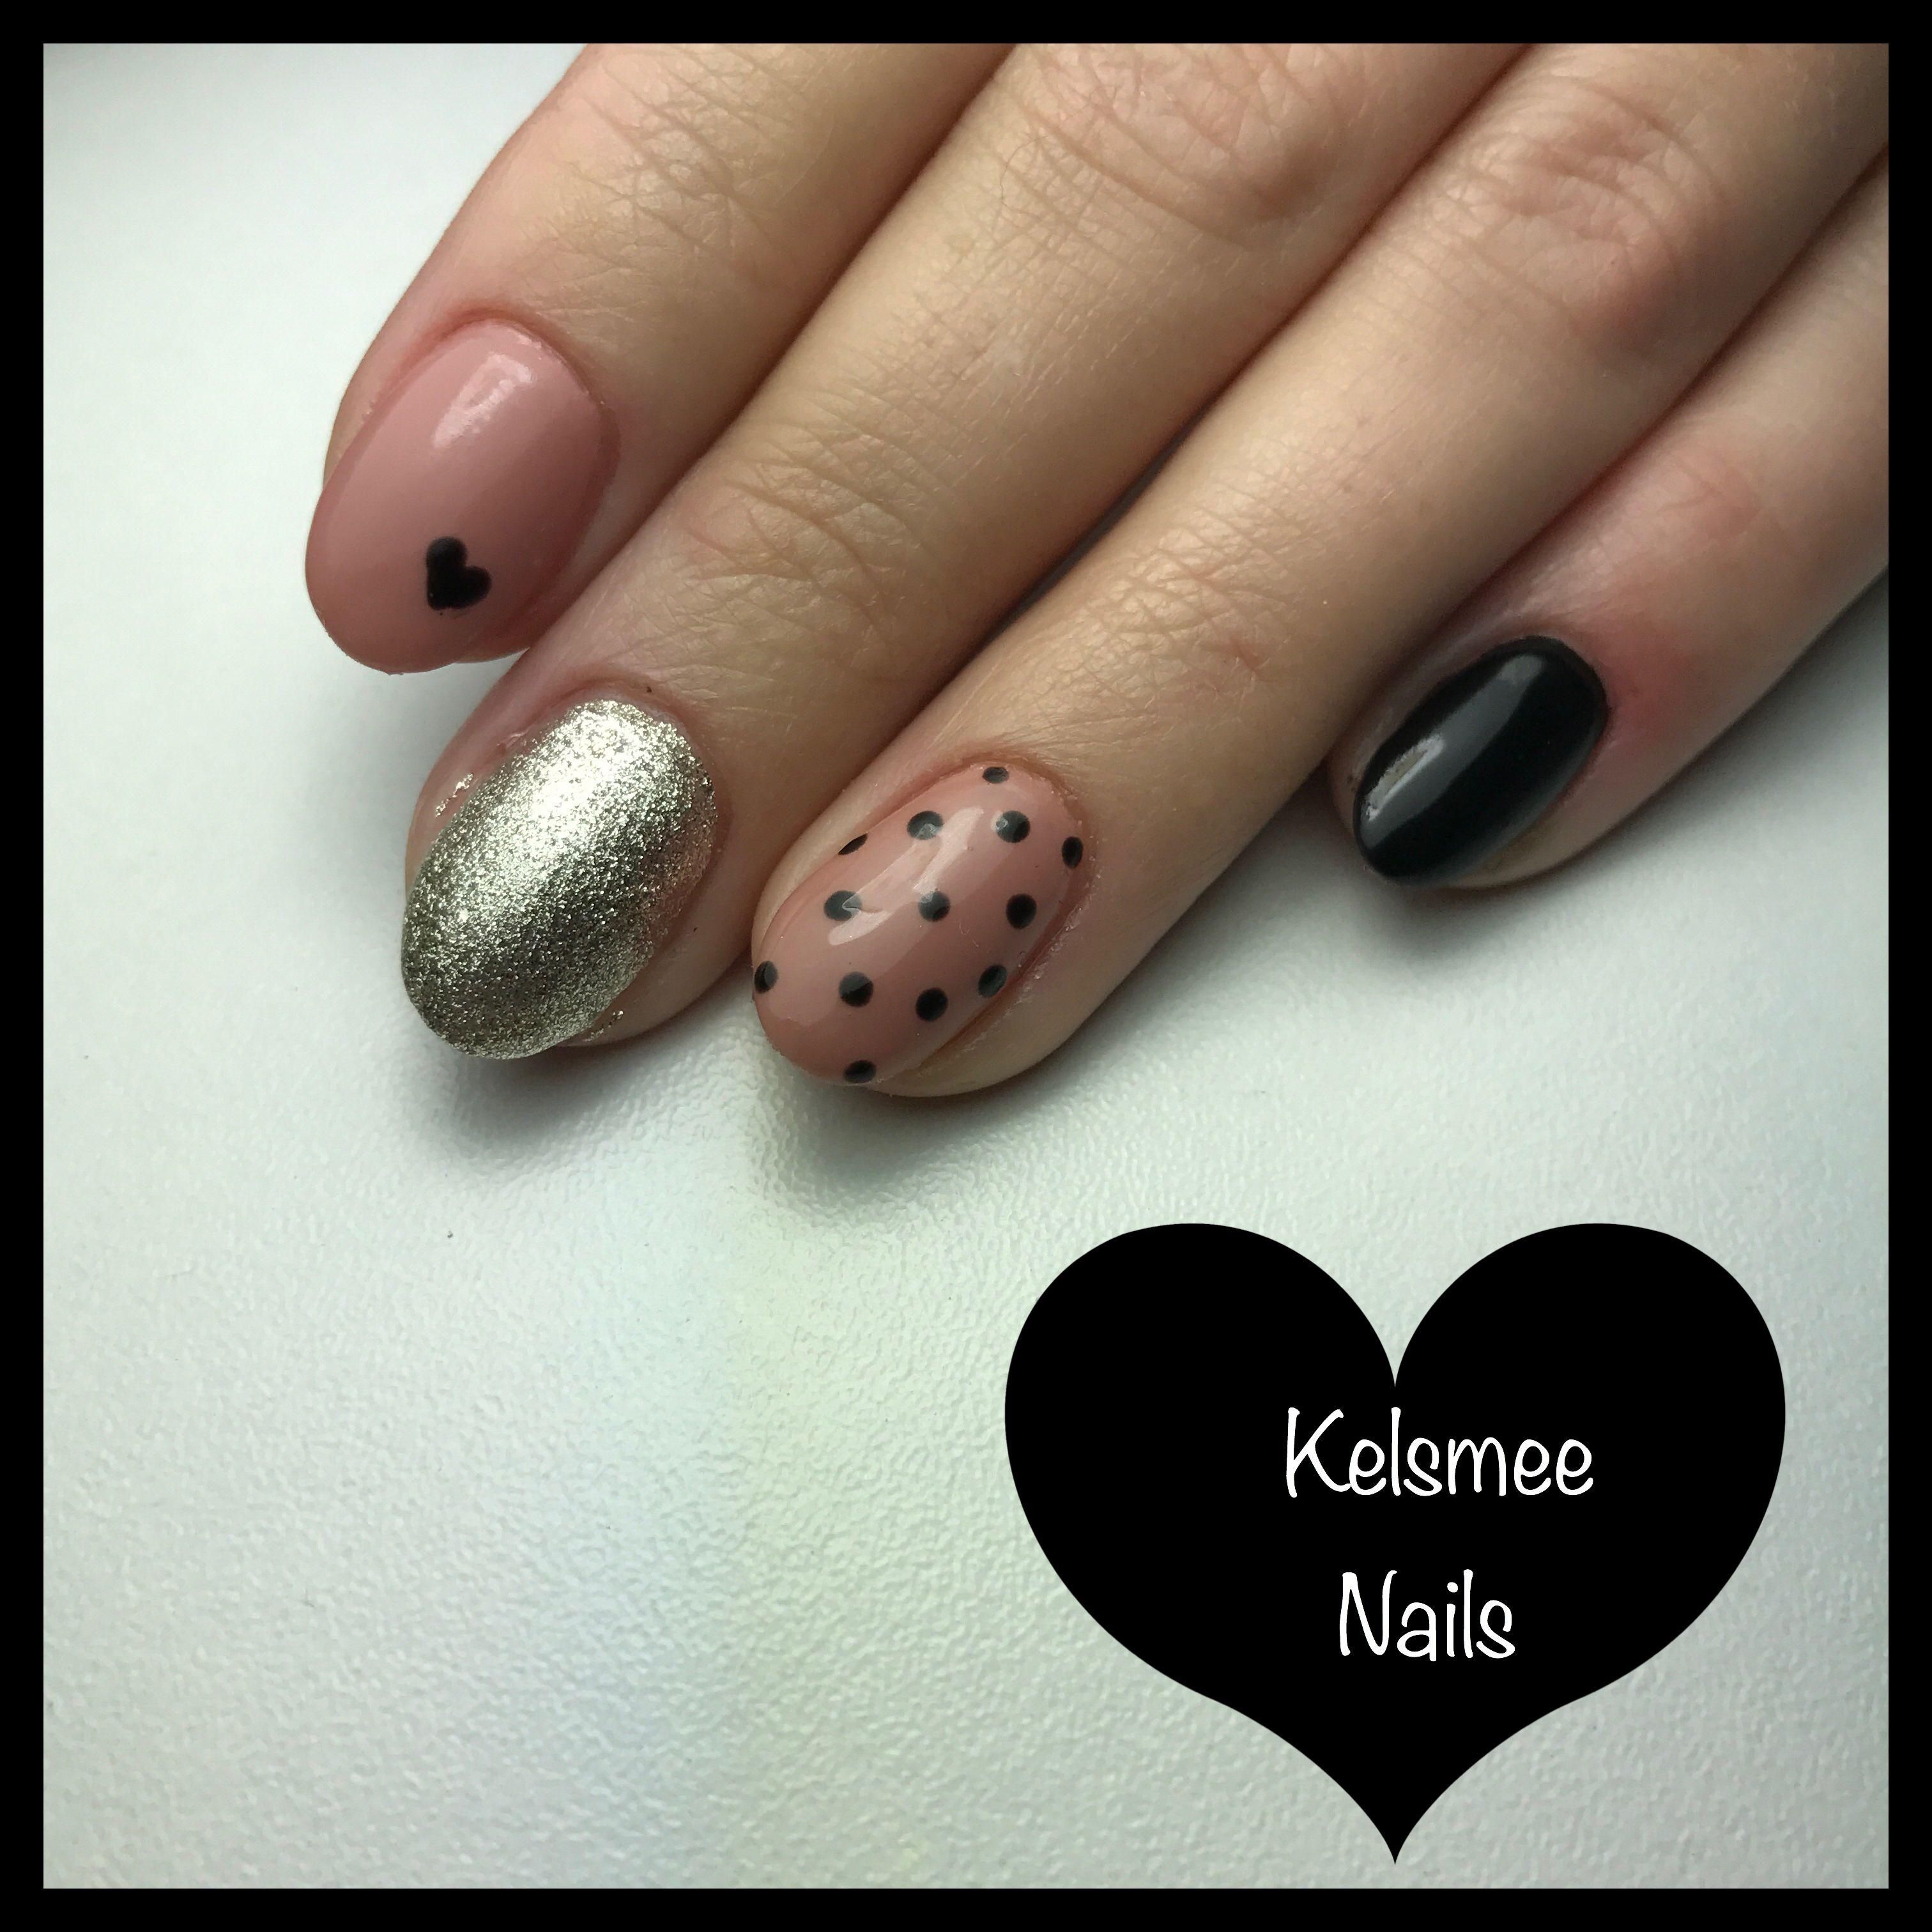 Leopardo uñas | Manicura de uñas, Uñas doradas, Disenos de unas